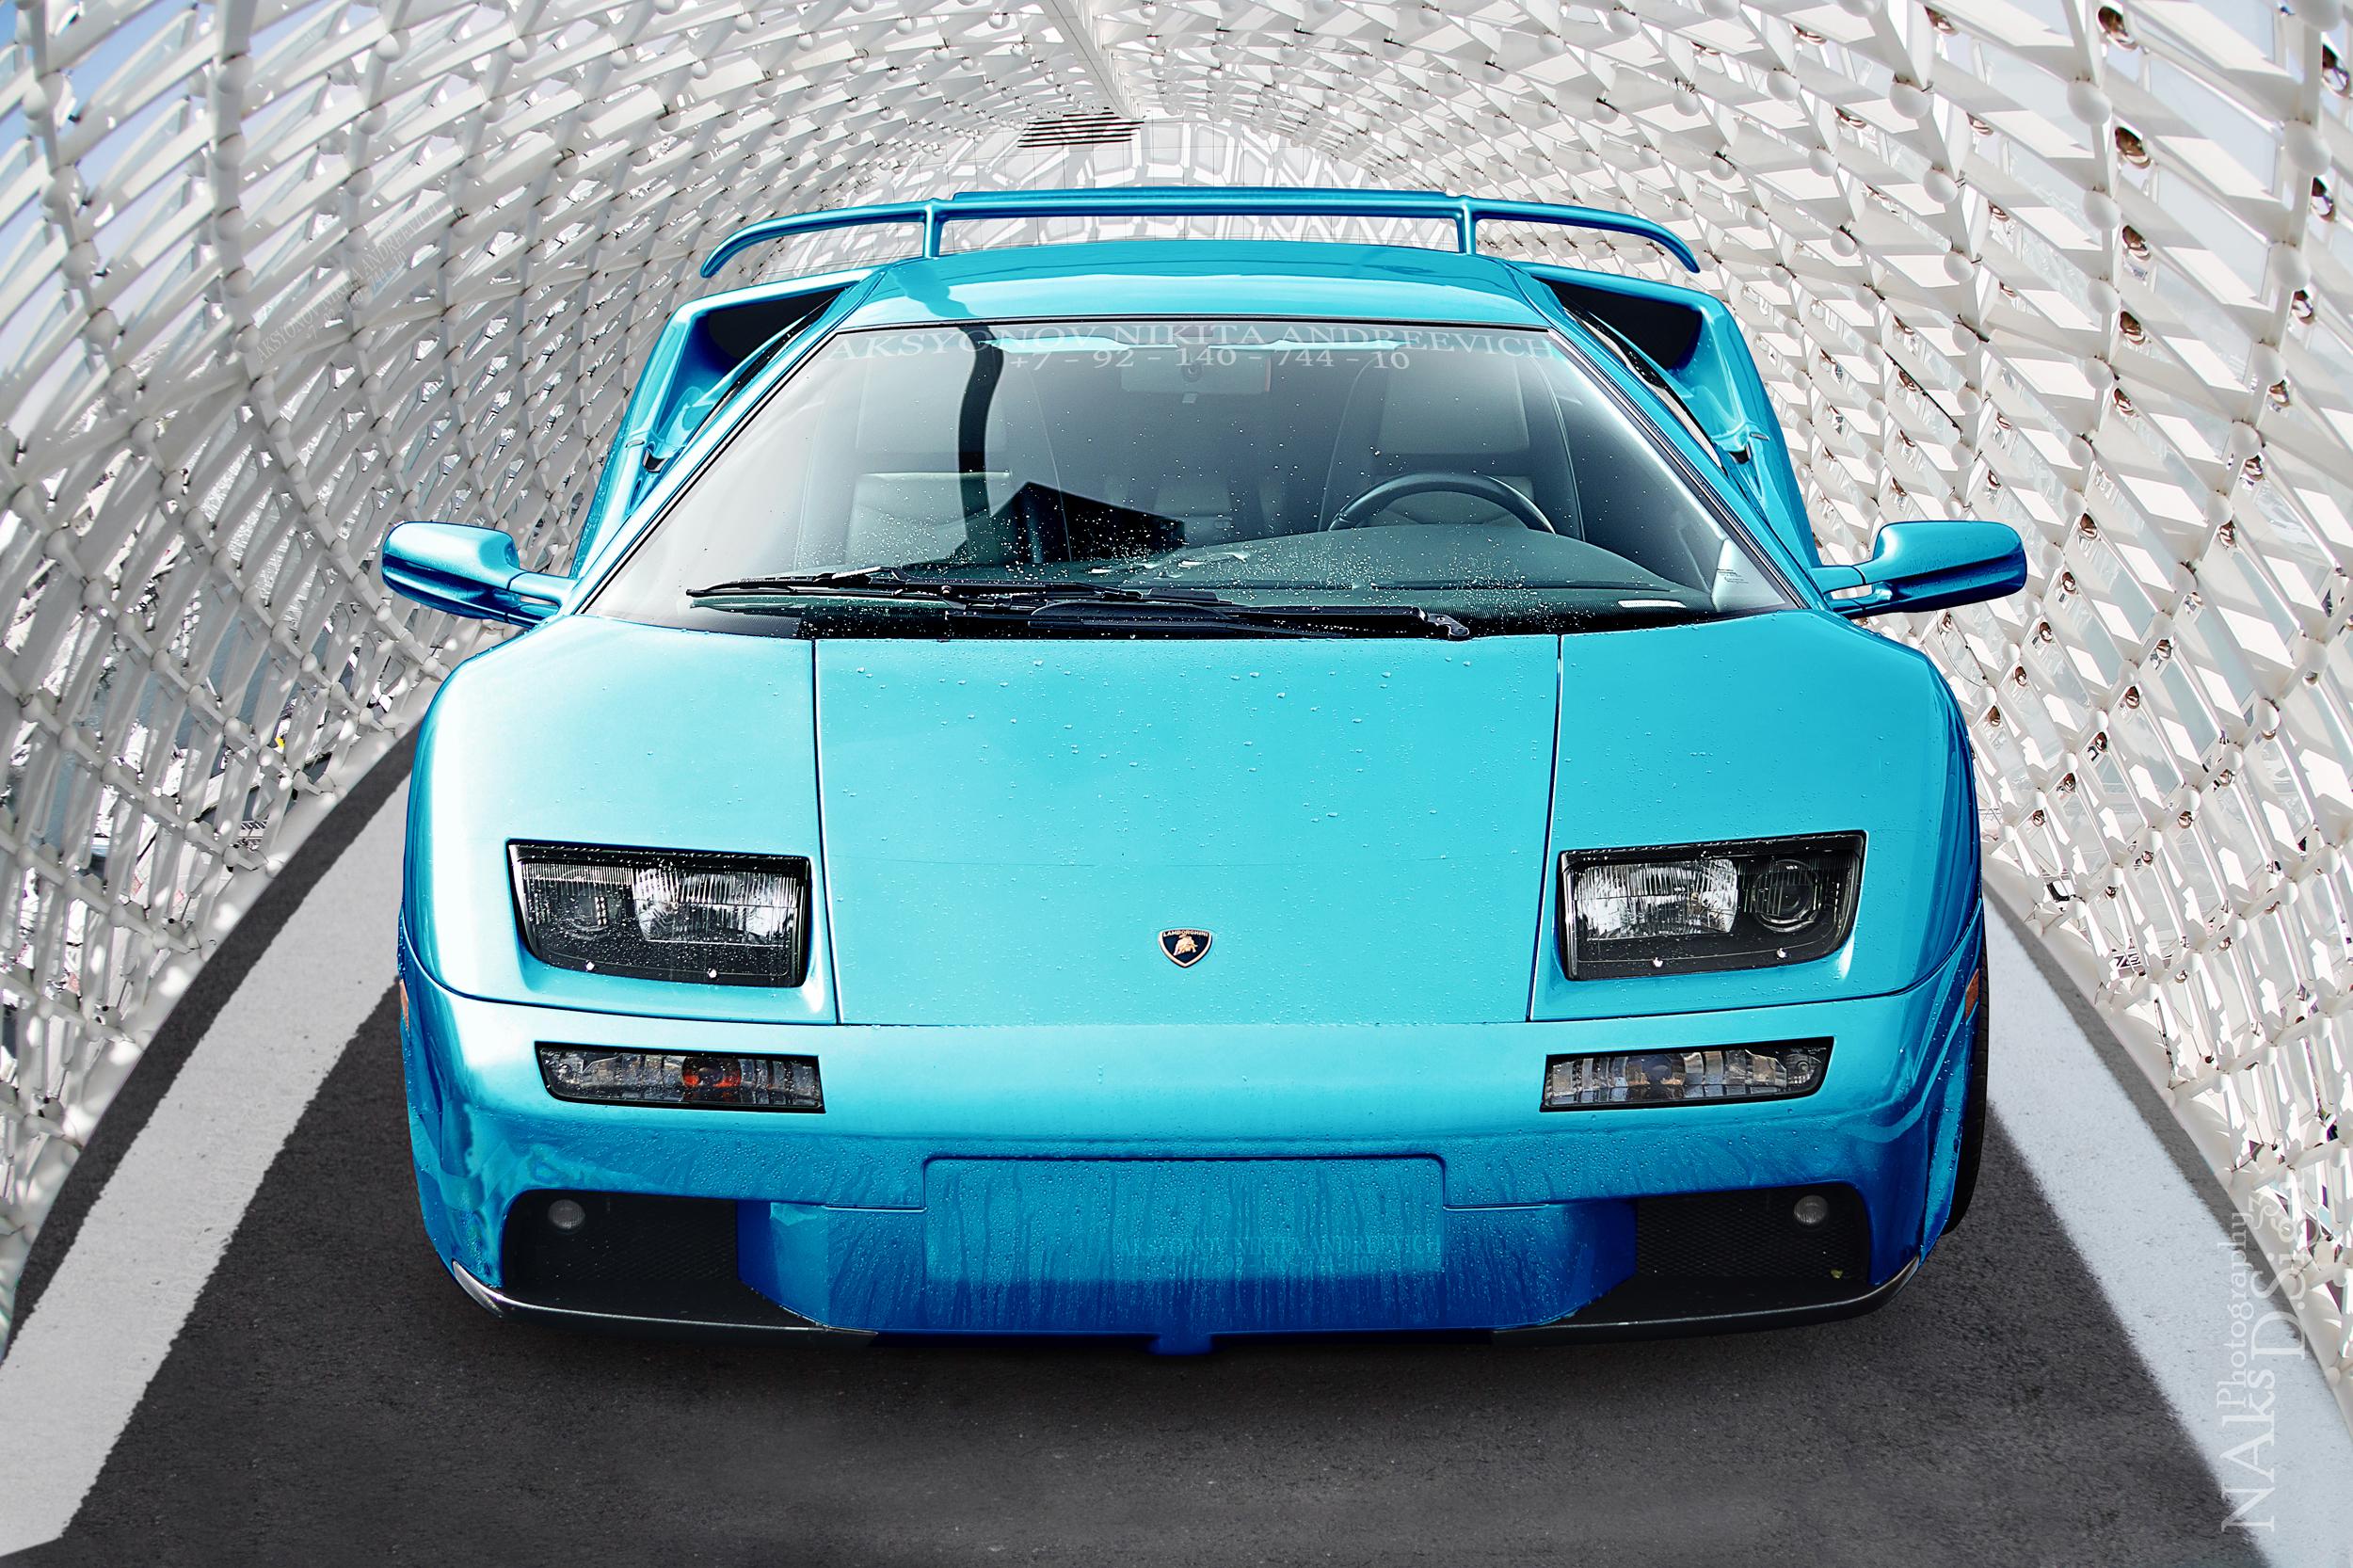 ... Classic, Water, Car, Rain, Sport, Dark, Drops, Italian, Unique, Azure,  Super, Bull, Class, Retro, Exotic, V, Hyper, Diablo, 12, Carbon, Lamborghini,  ...